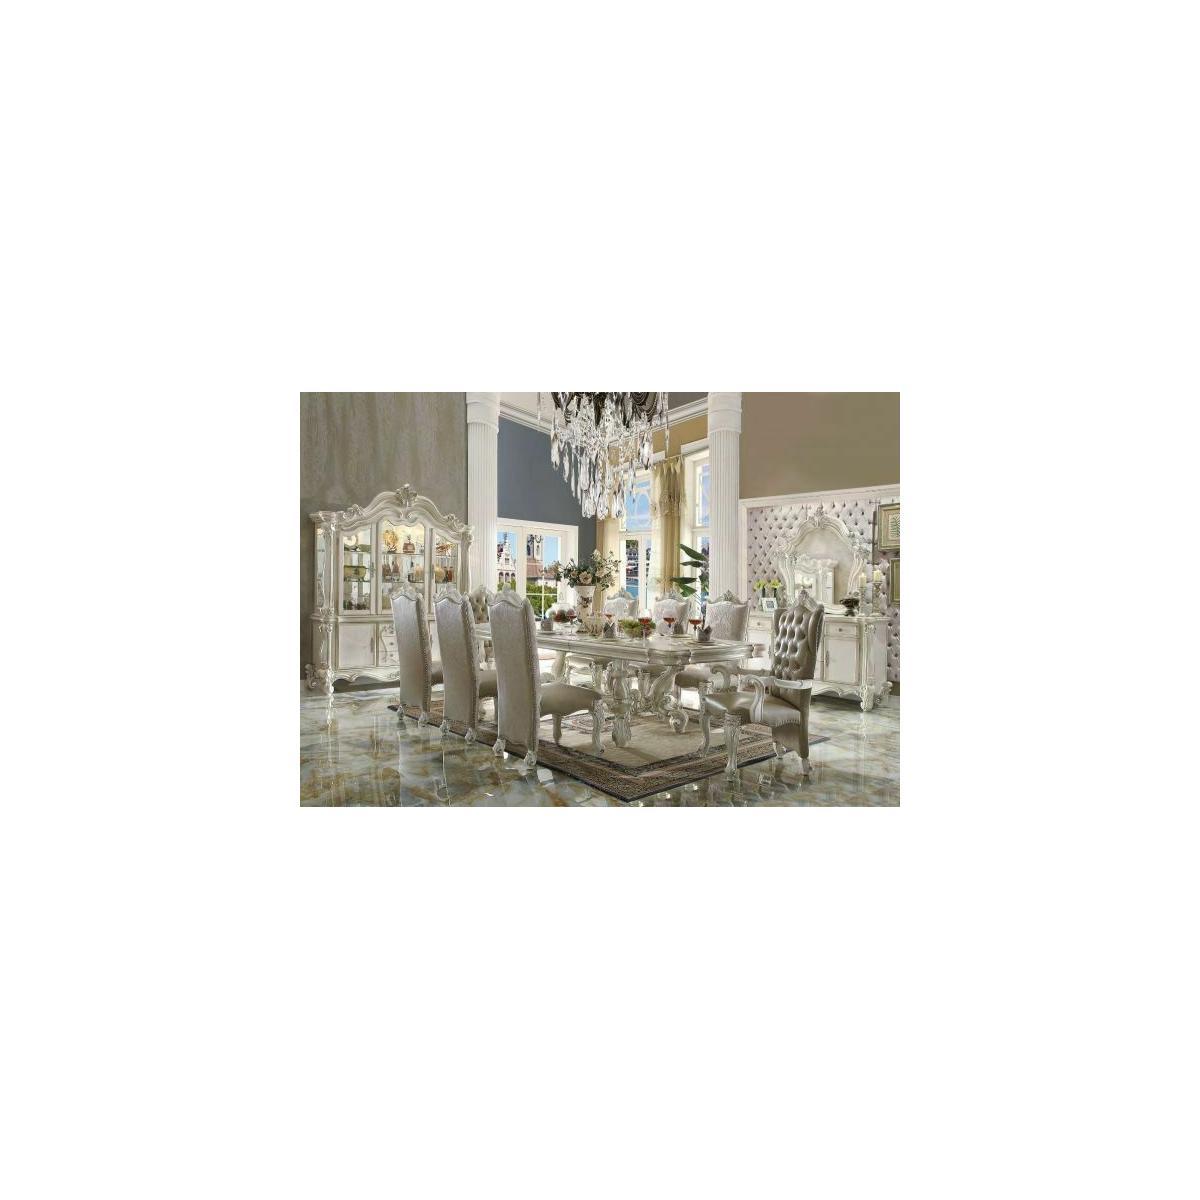 ACME Versailles Dining Table - 61130 - Bone White